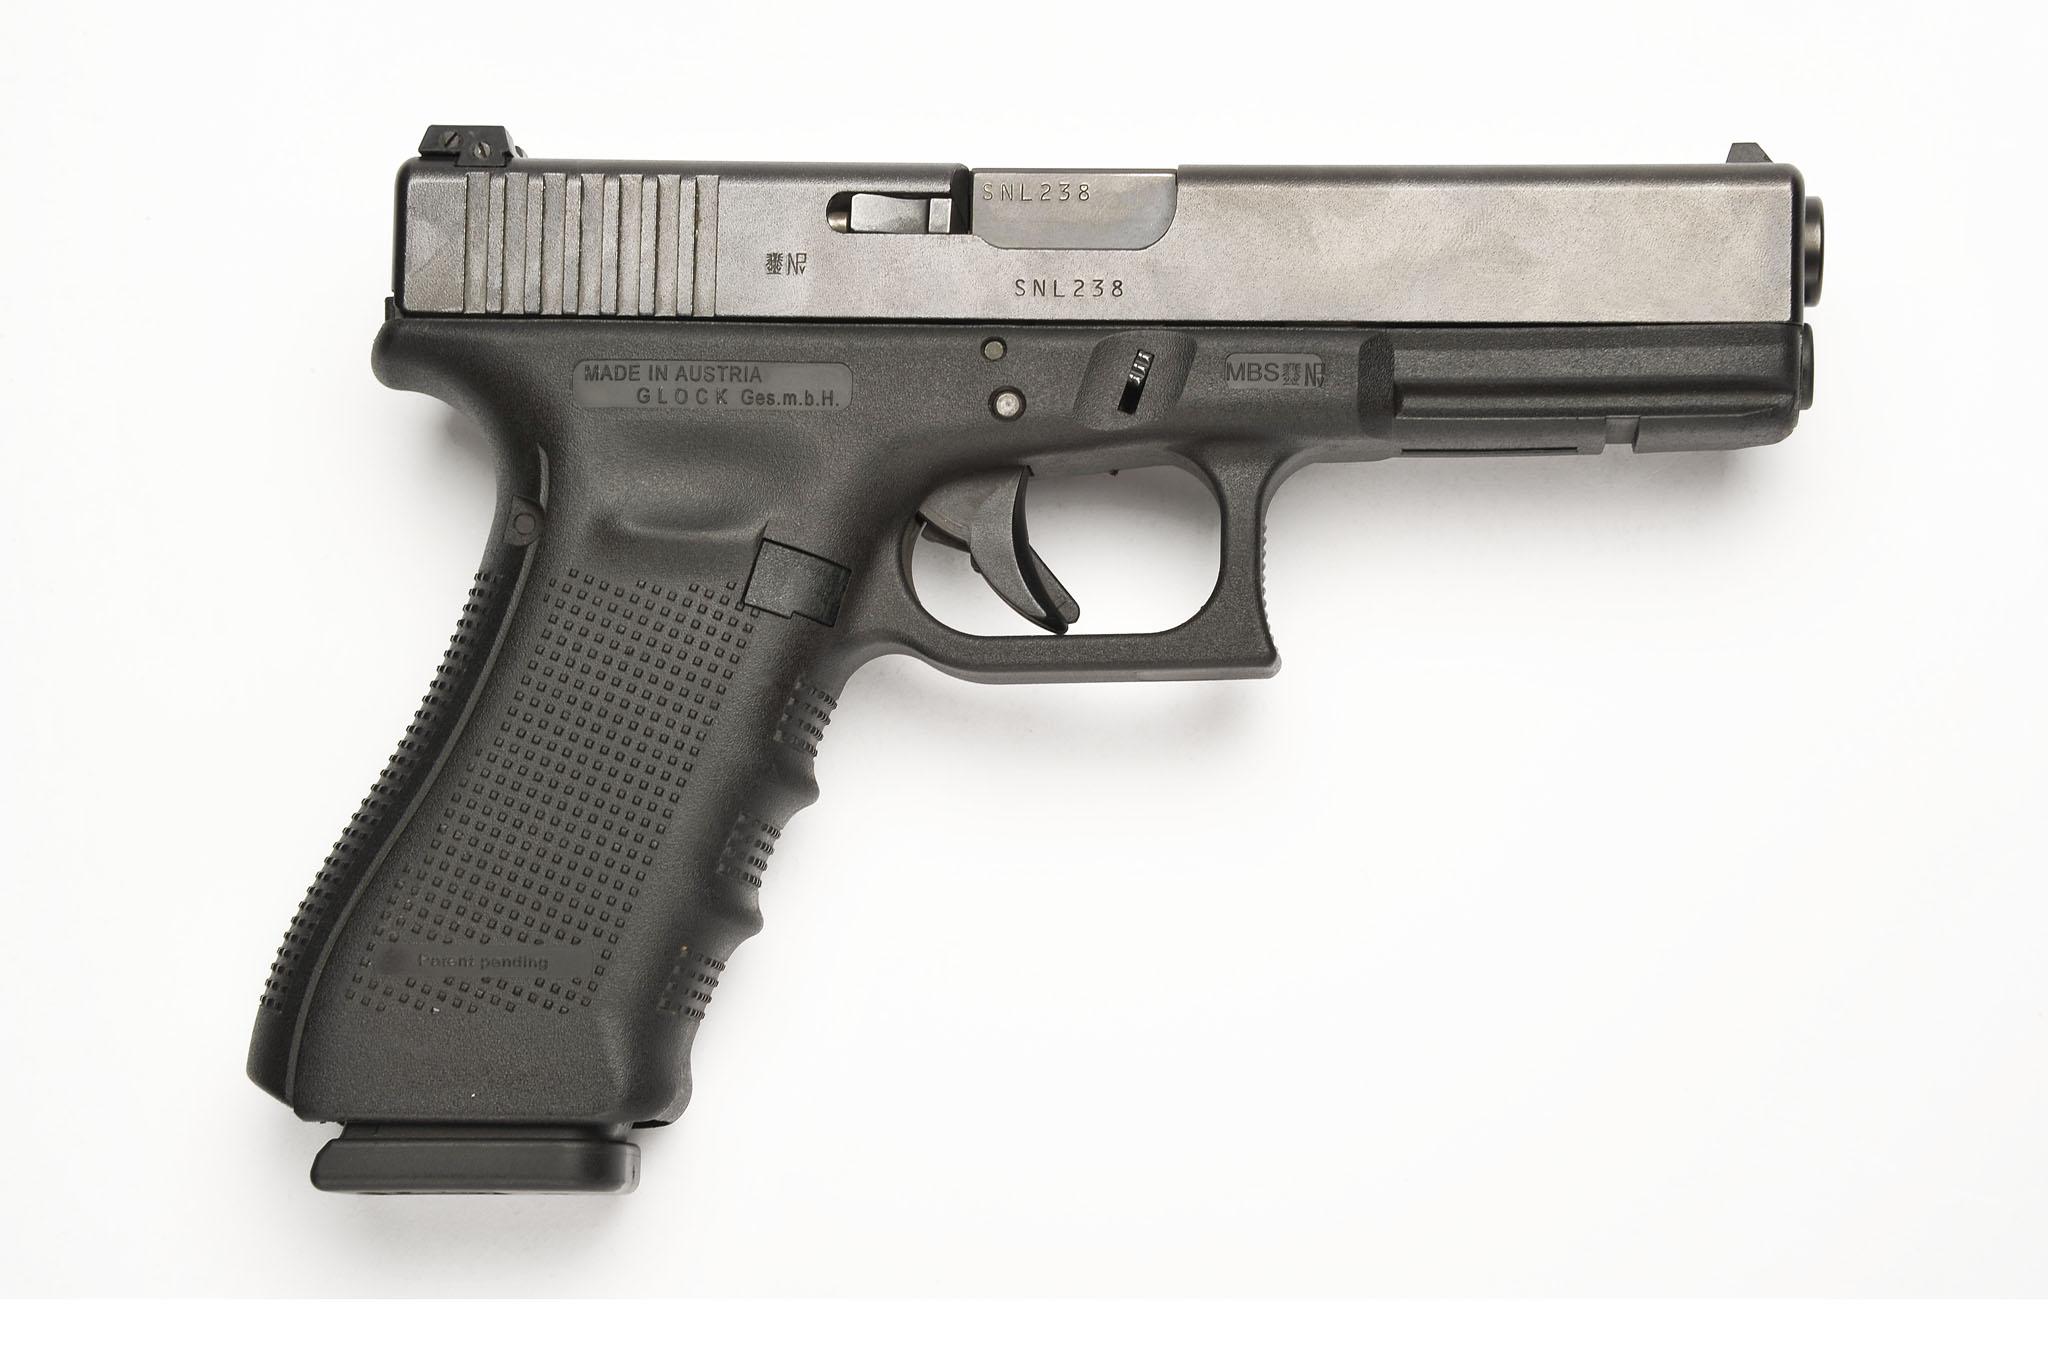 Gallery: Glock 17 Gen 3 Gen 4 - Pistols - Gallery ...